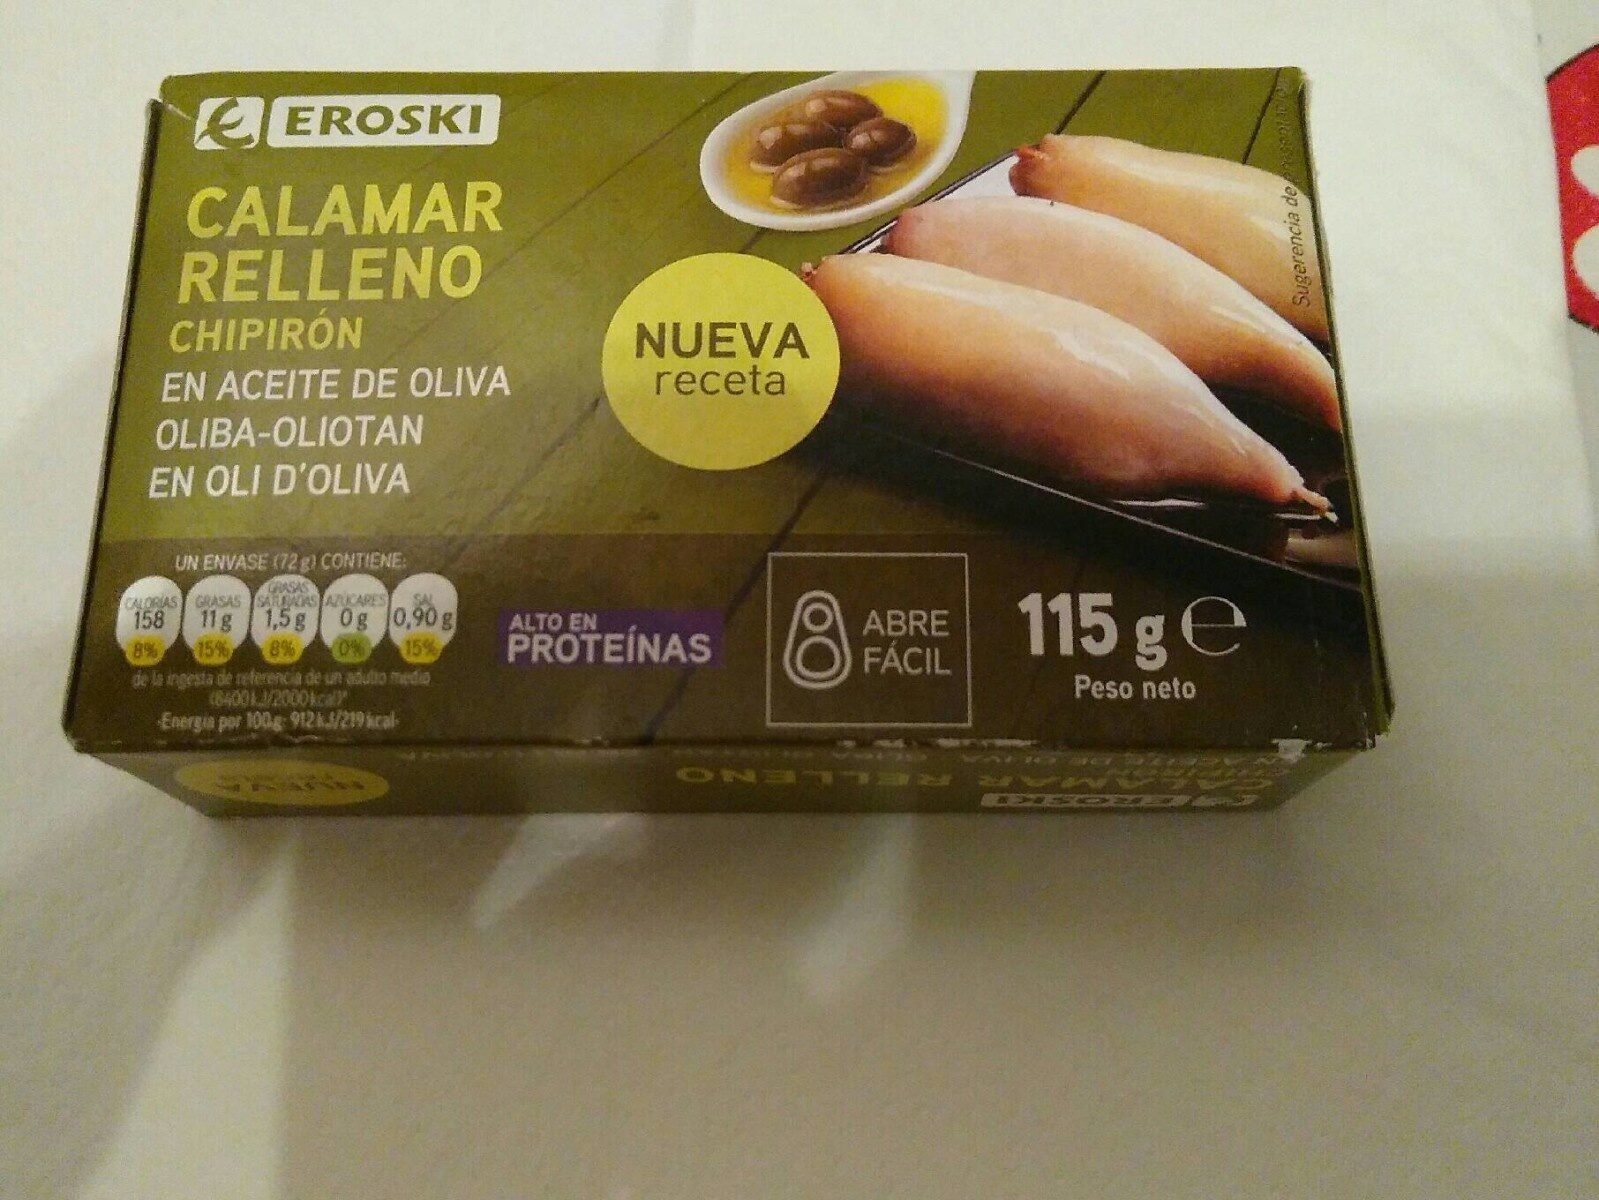 Calamar relleno en aceite de oliva - Produit